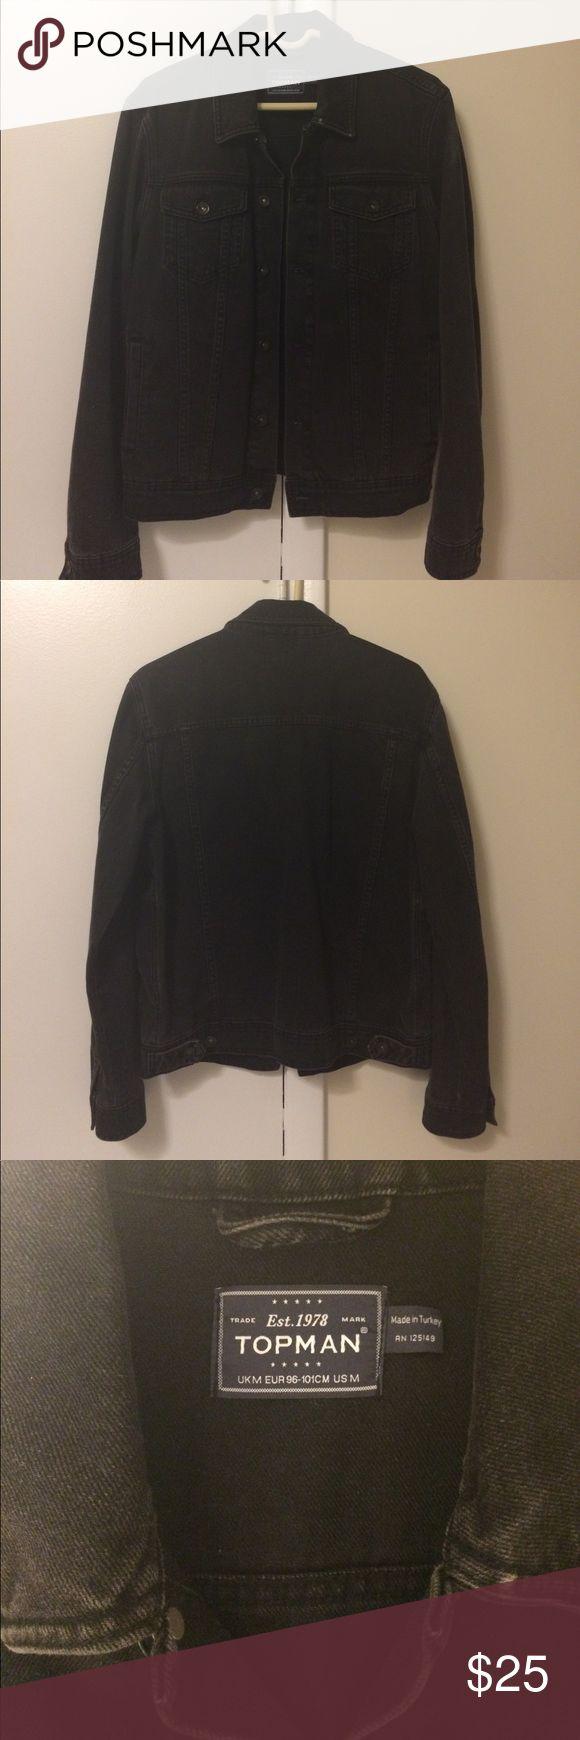 "TopMan black denim jacket (M) Men's black denim jacket from TopMan. Size medium, designed to fit chest size 38-40"". Rarely worn! 100% cotton. Topman Jackets & Coats Lightweight & Shirt Jackets"